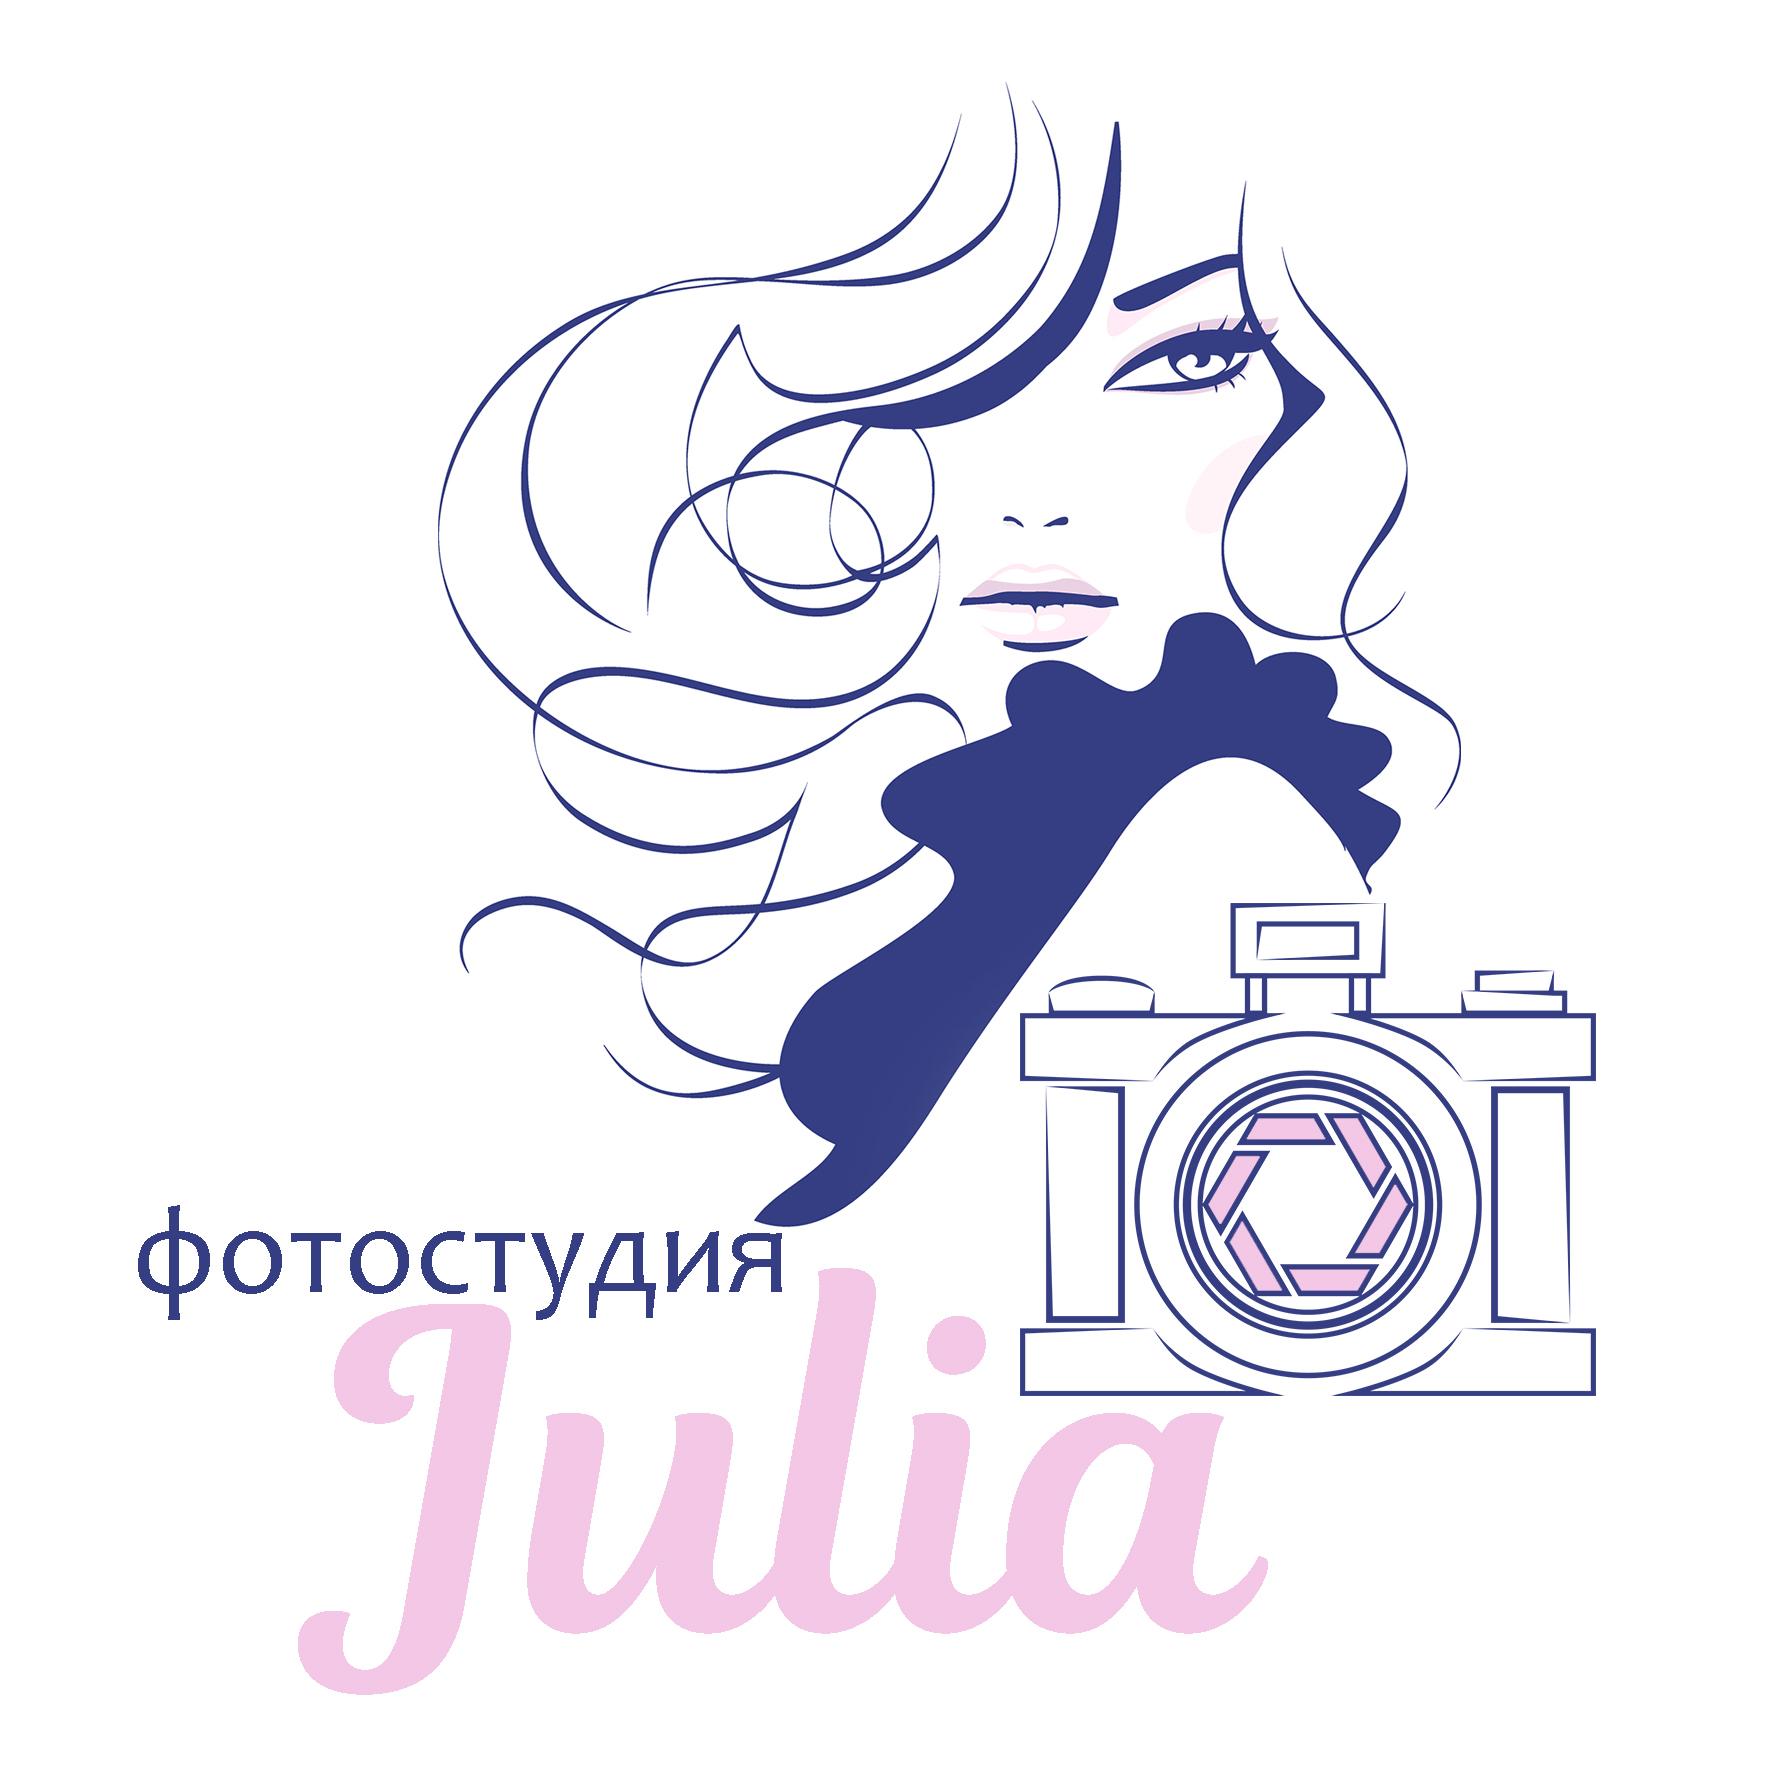 Фотостудия.Имидж Студия Julia